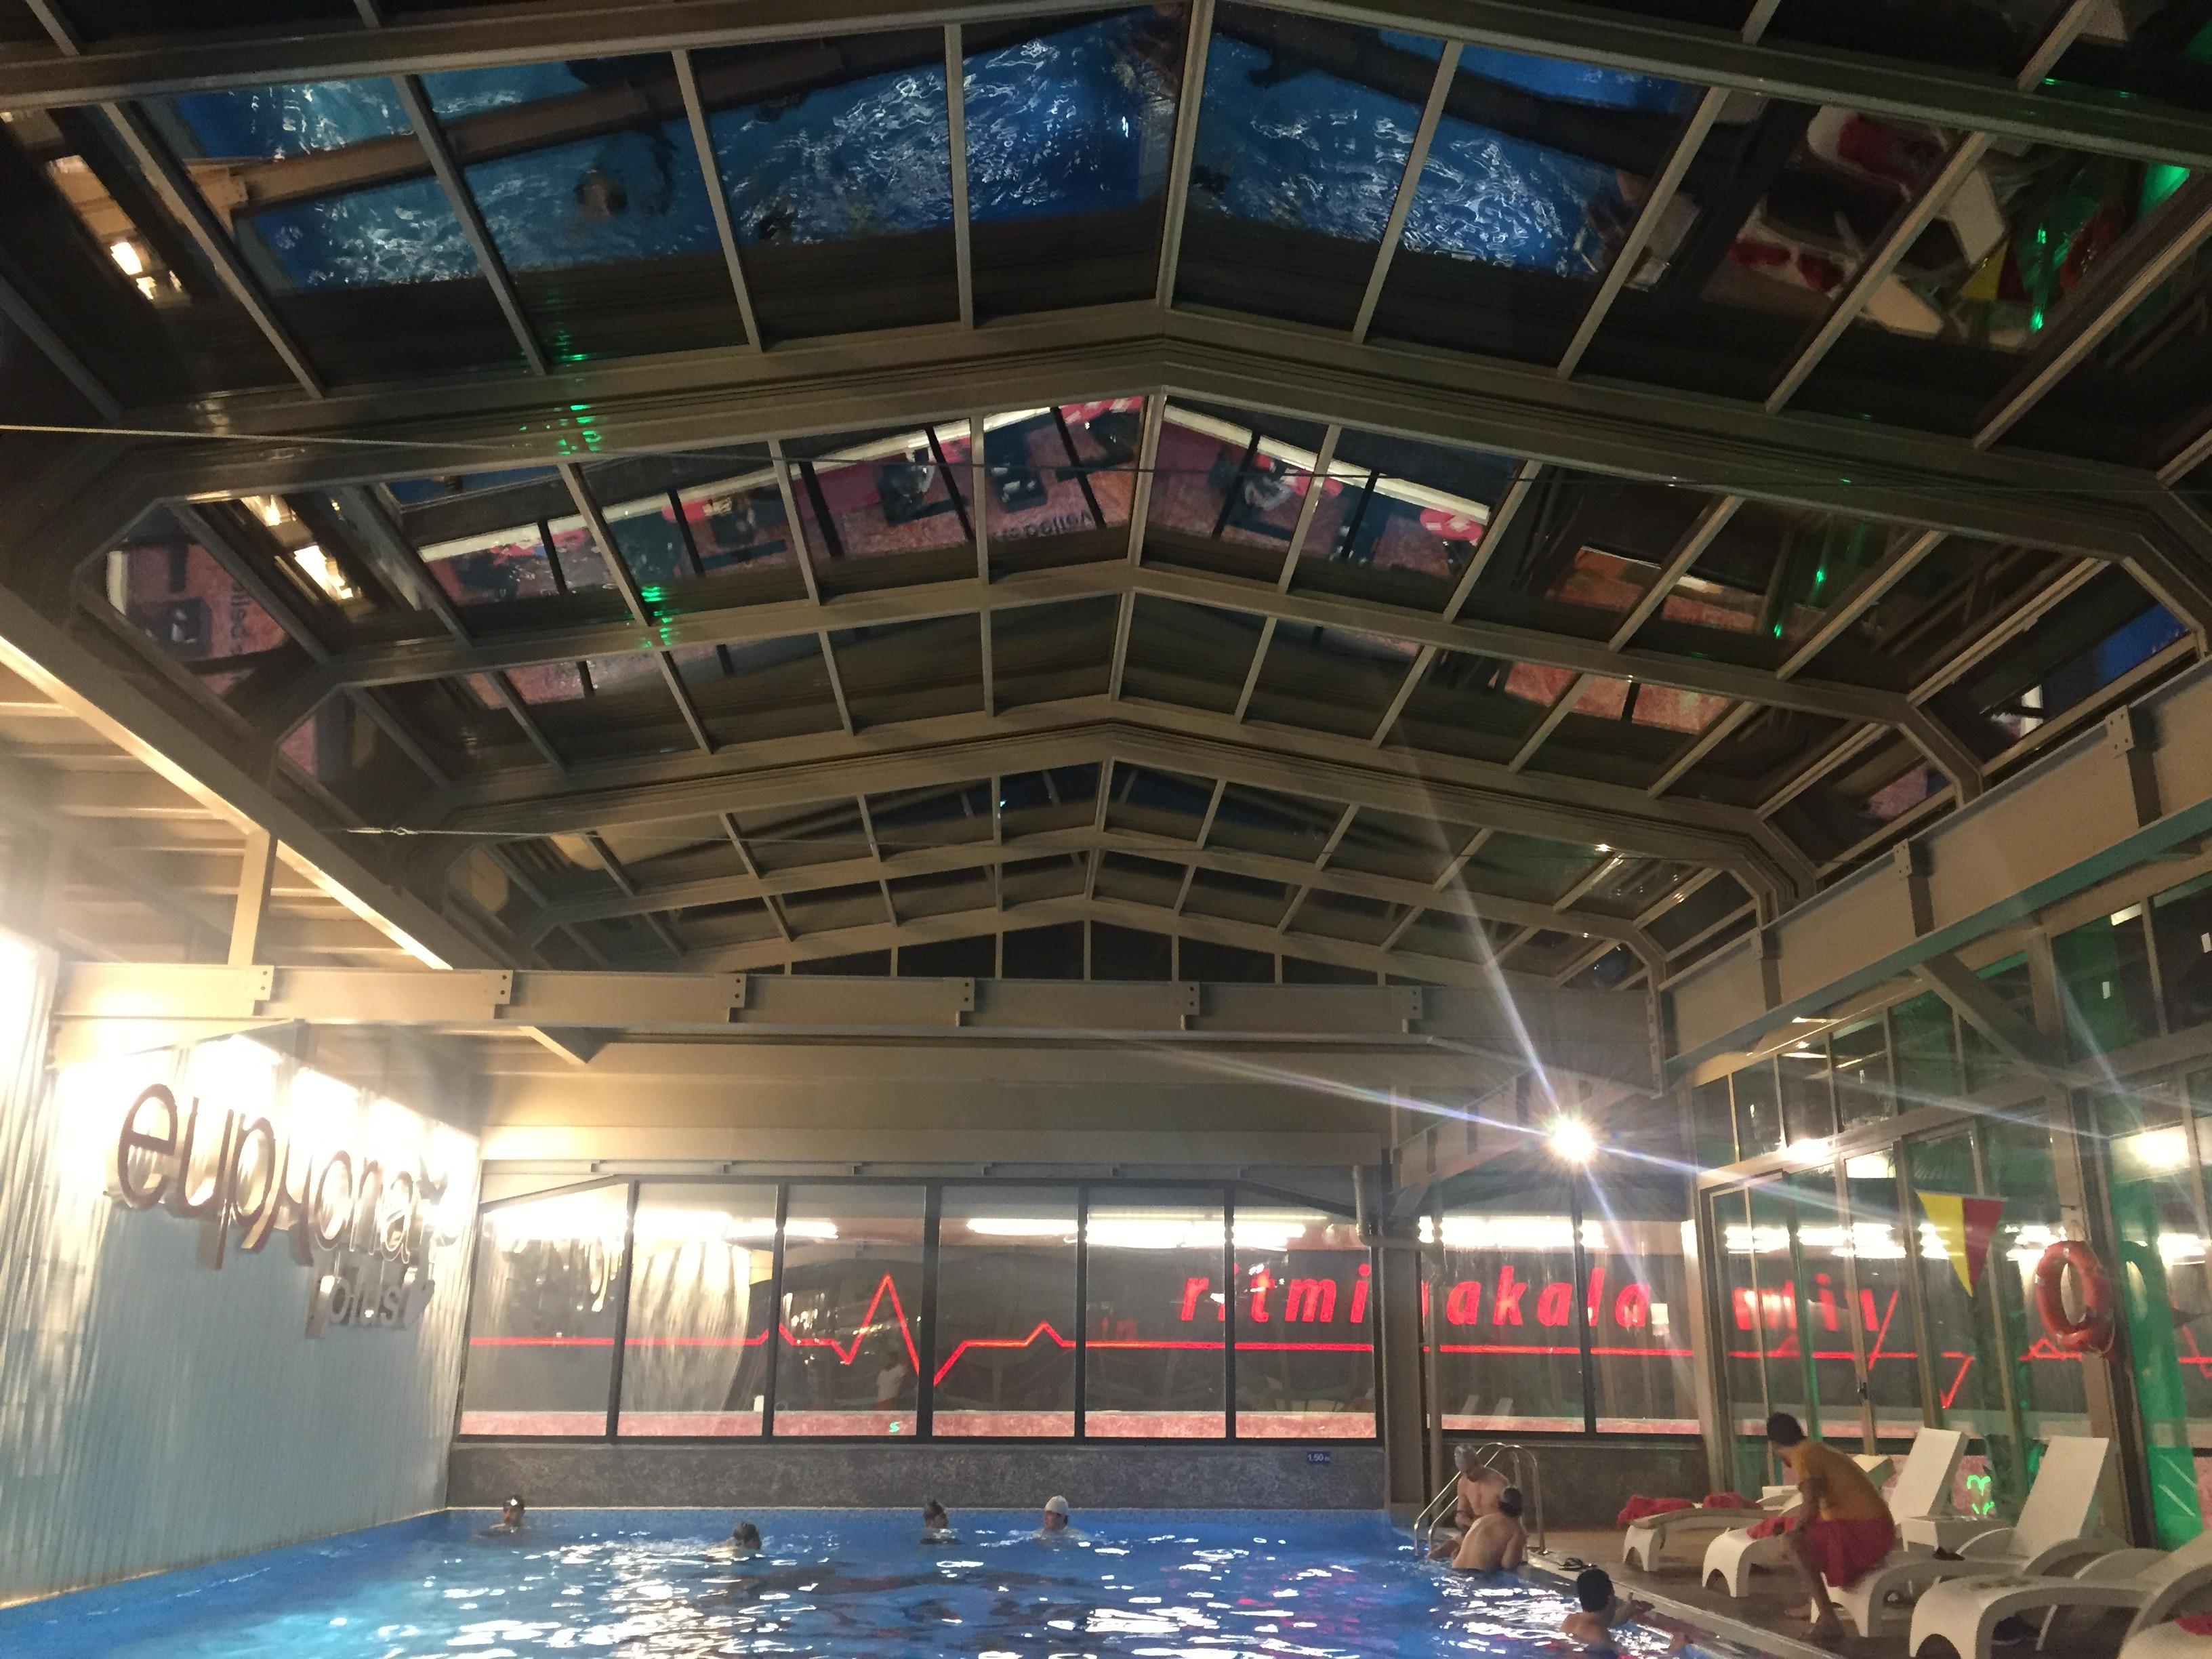 Retractable Enclosures Retractable Glass Roof Retractable Enclosures  Retractable Glass Pool Enclosures Retractable Skylight Glass Roof .